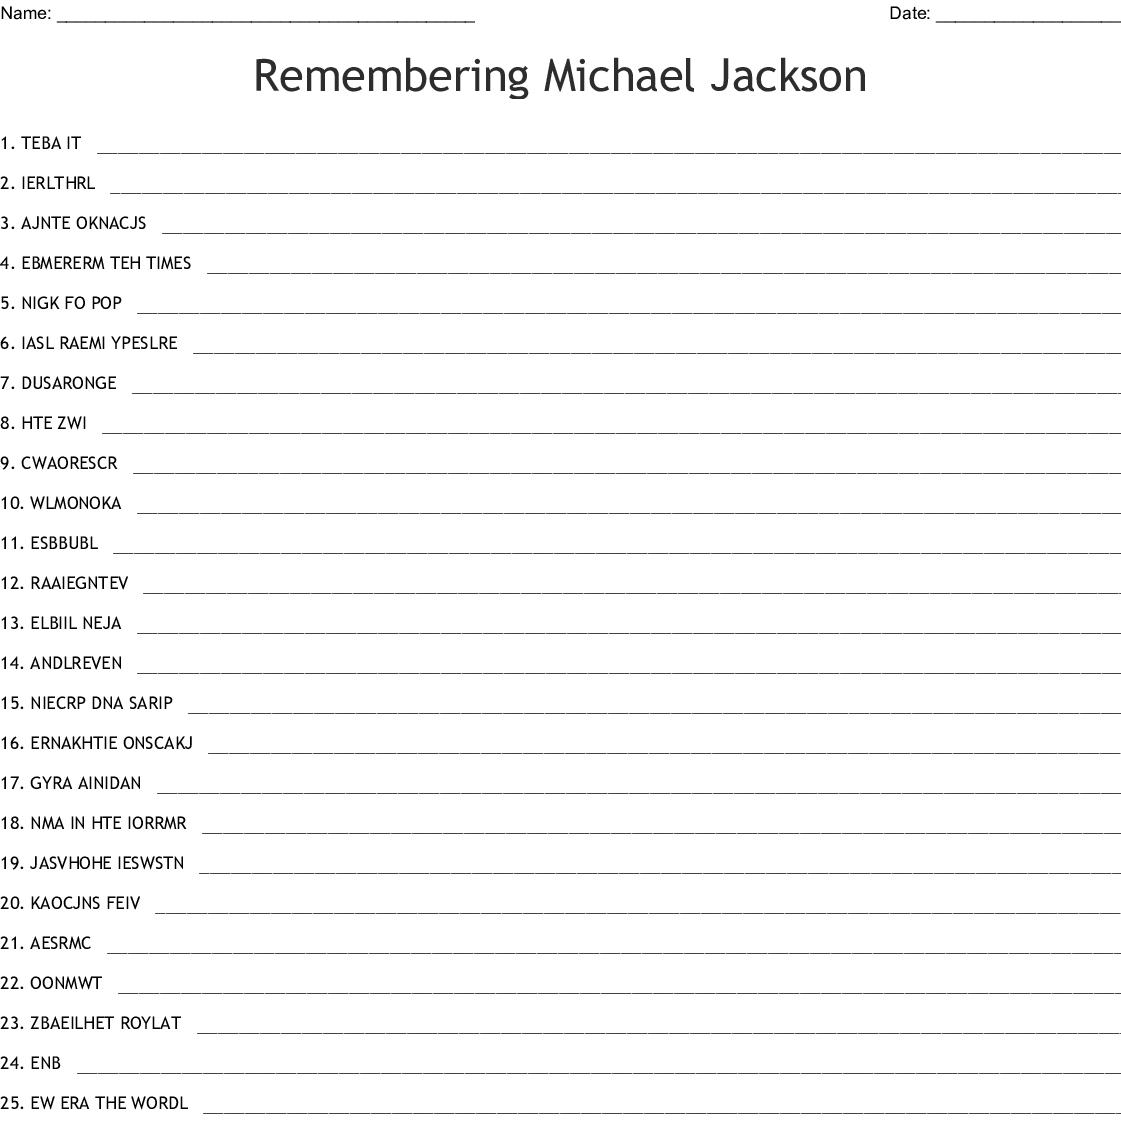 Michael Jackson Word Search